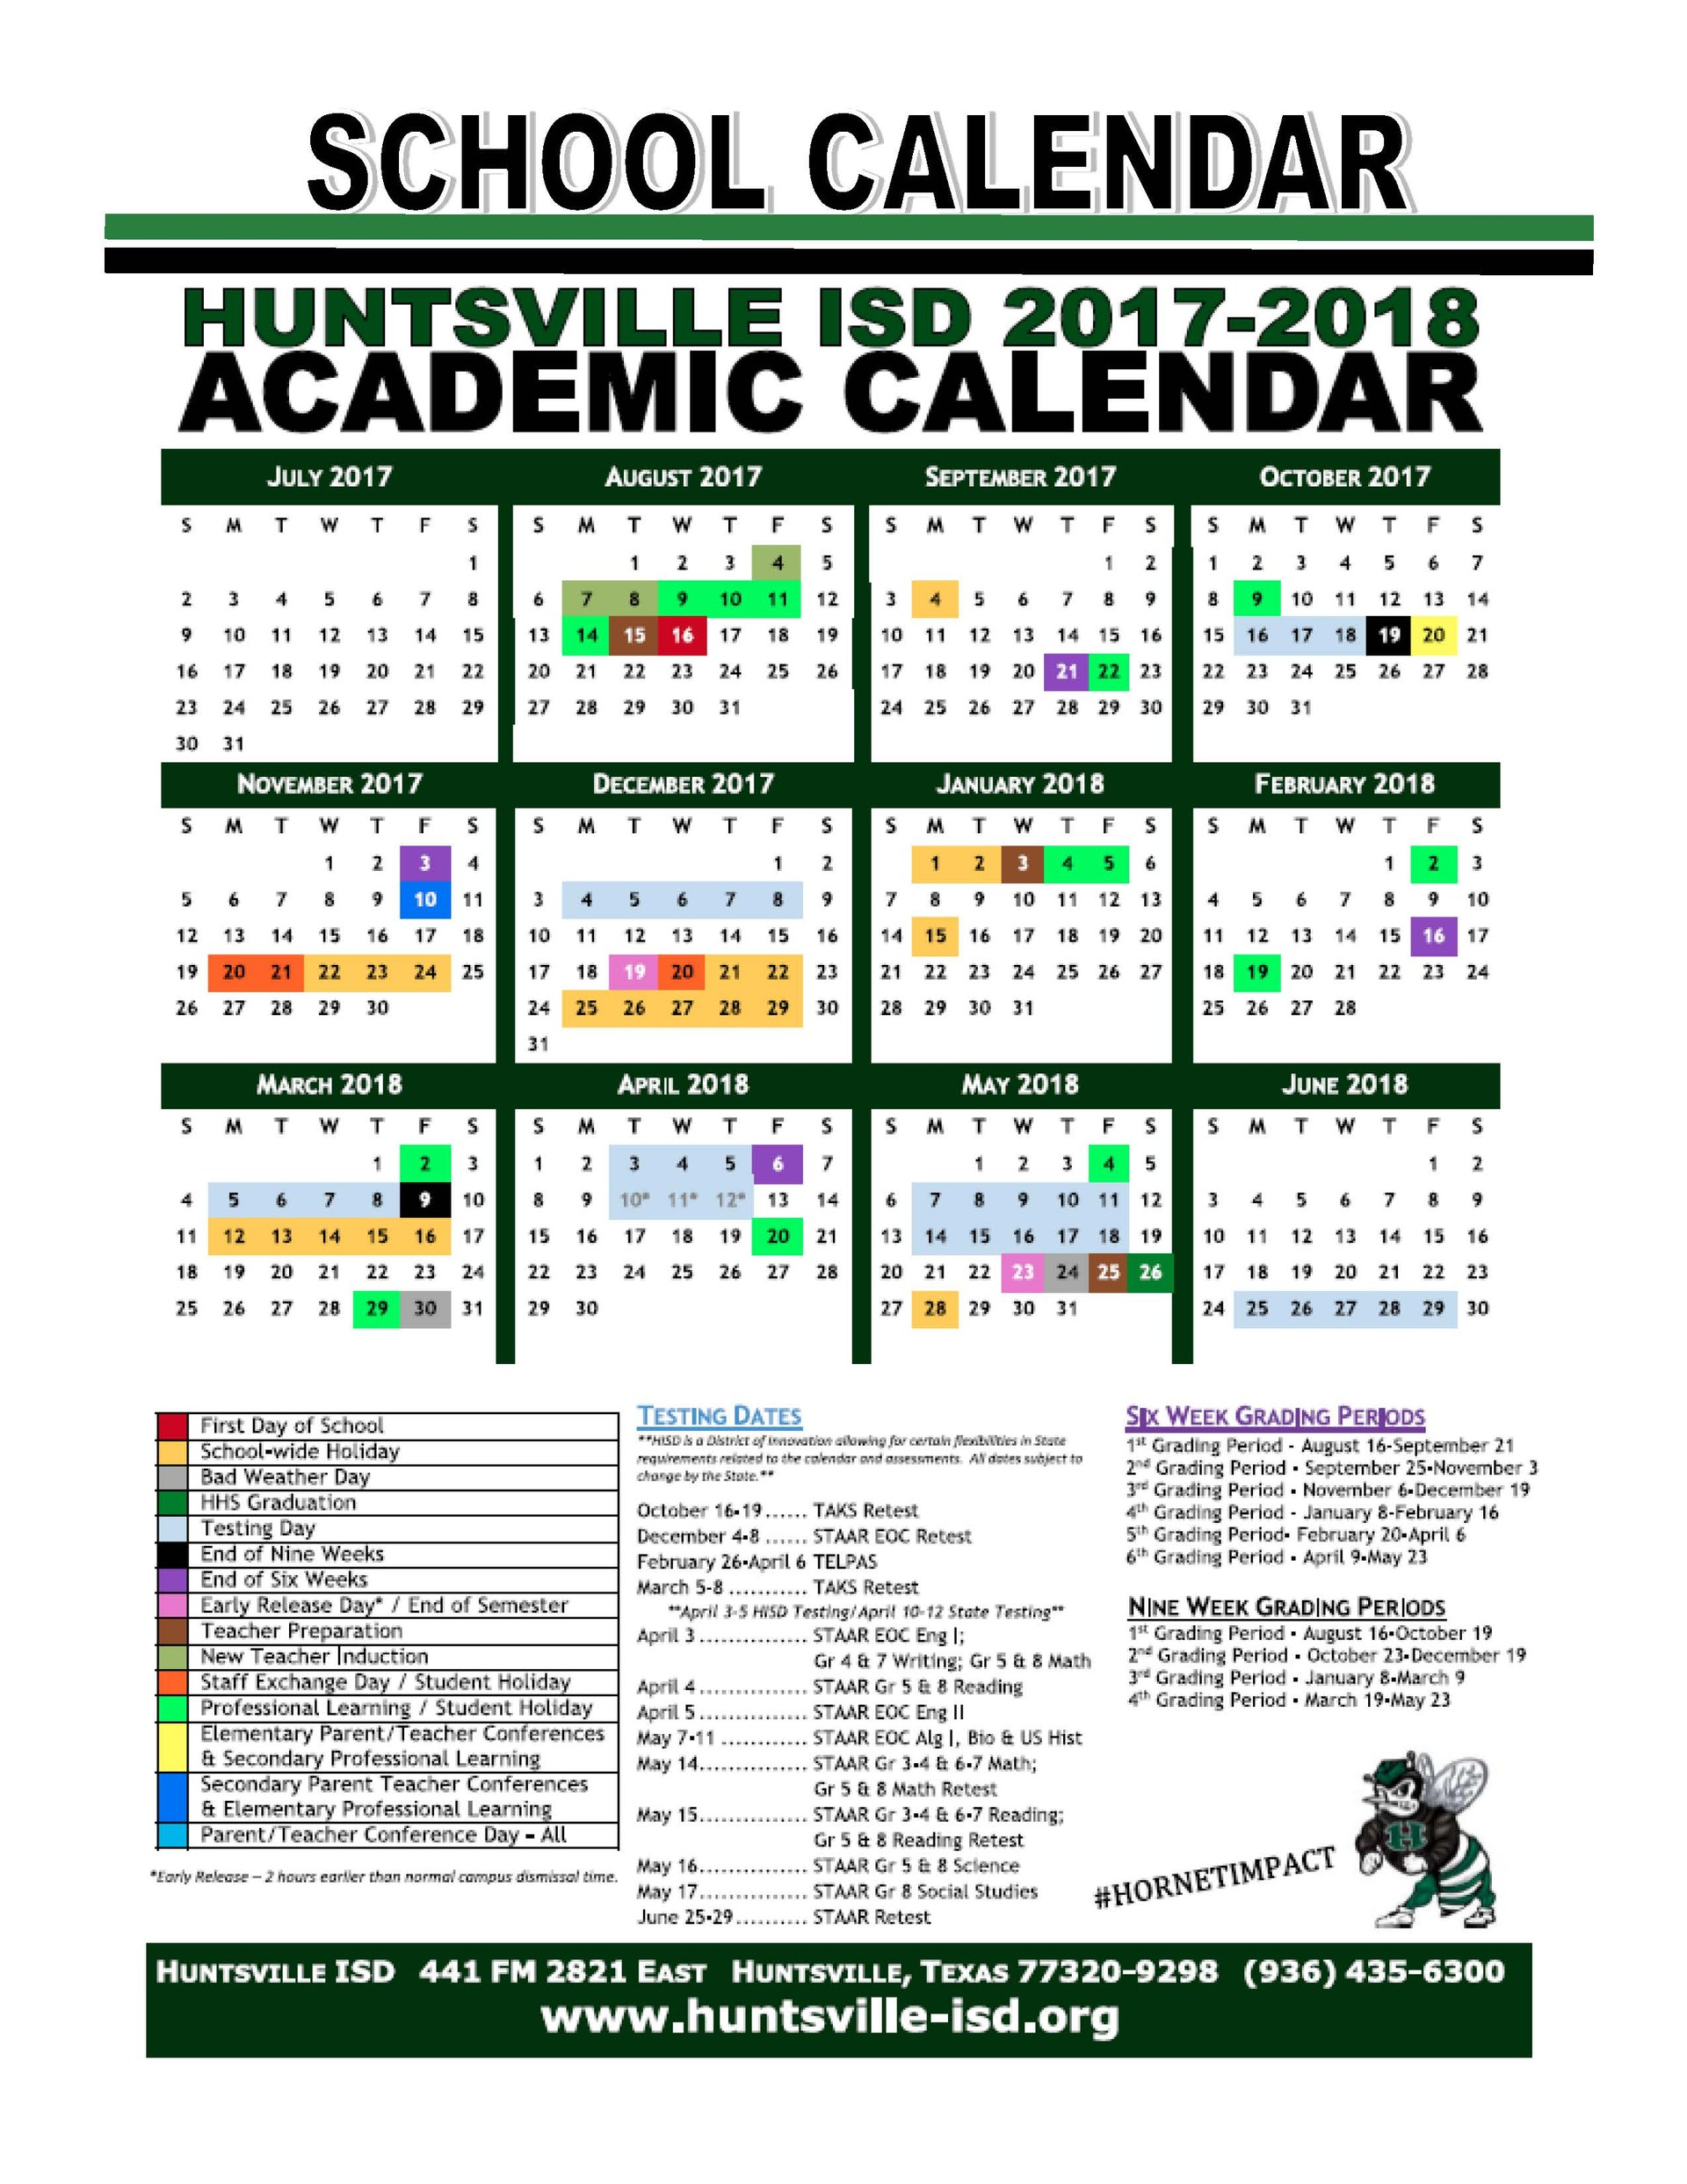 HISD 2017-18 Academic Calendar